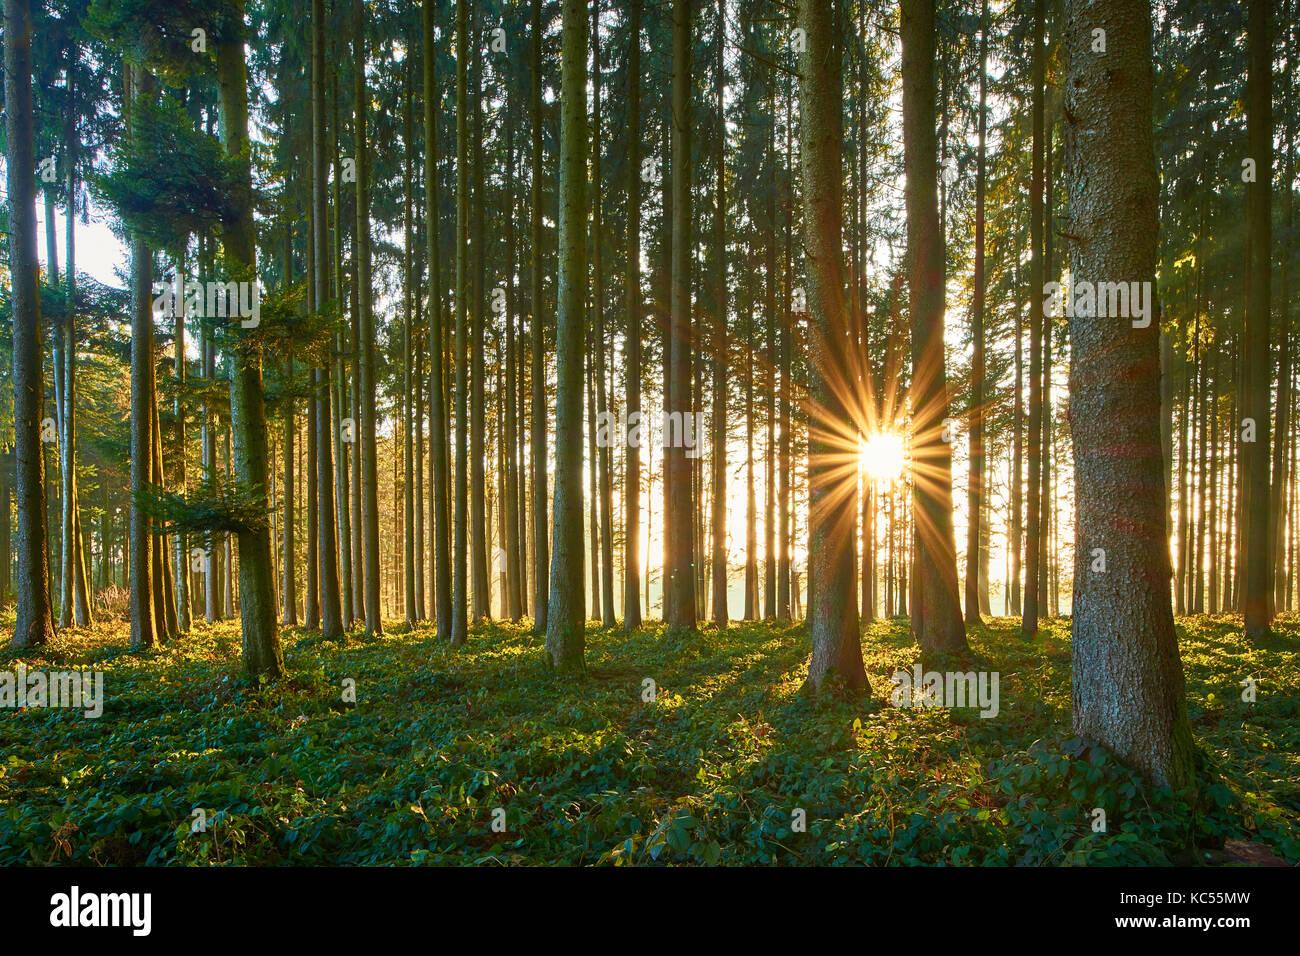 Sunbeams shine through tree trunks, spruce forest, Lindenberg, Canton Aargau, Switzerland - Stock Image